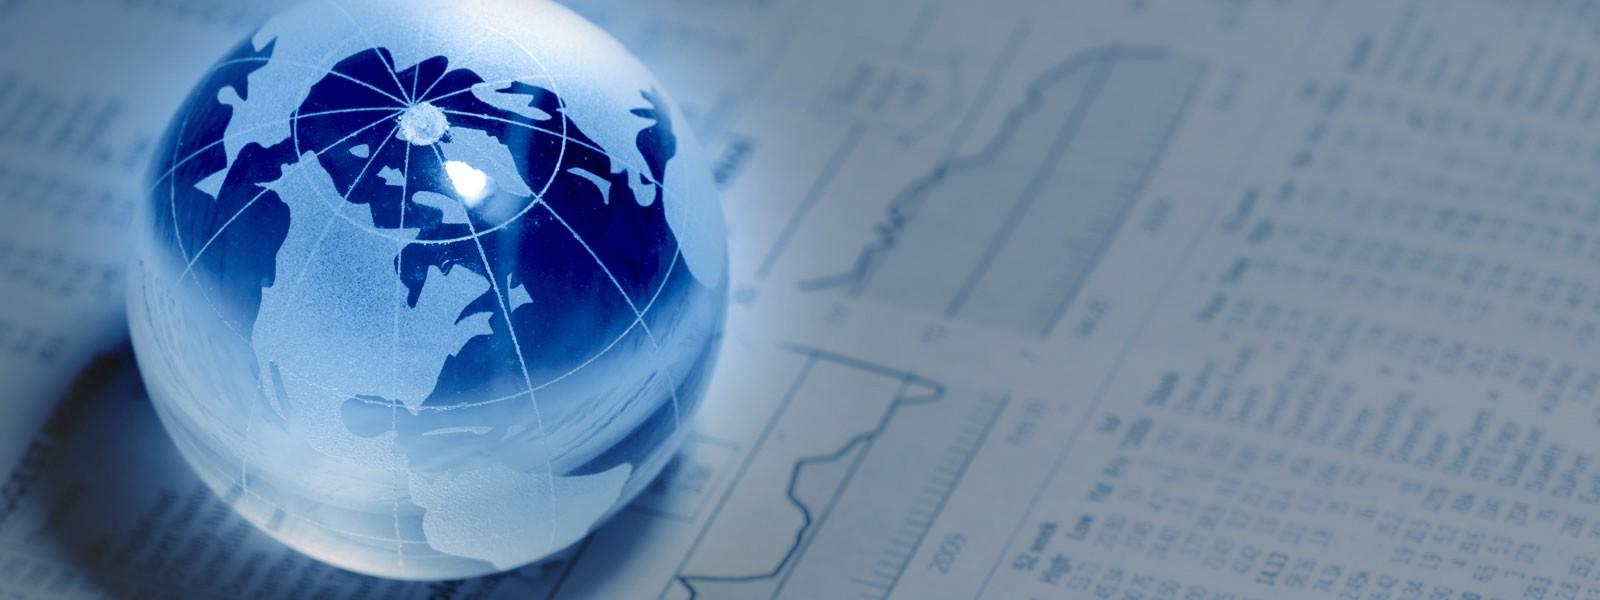 Economic Forum for Sustainable Development   LinkedIn